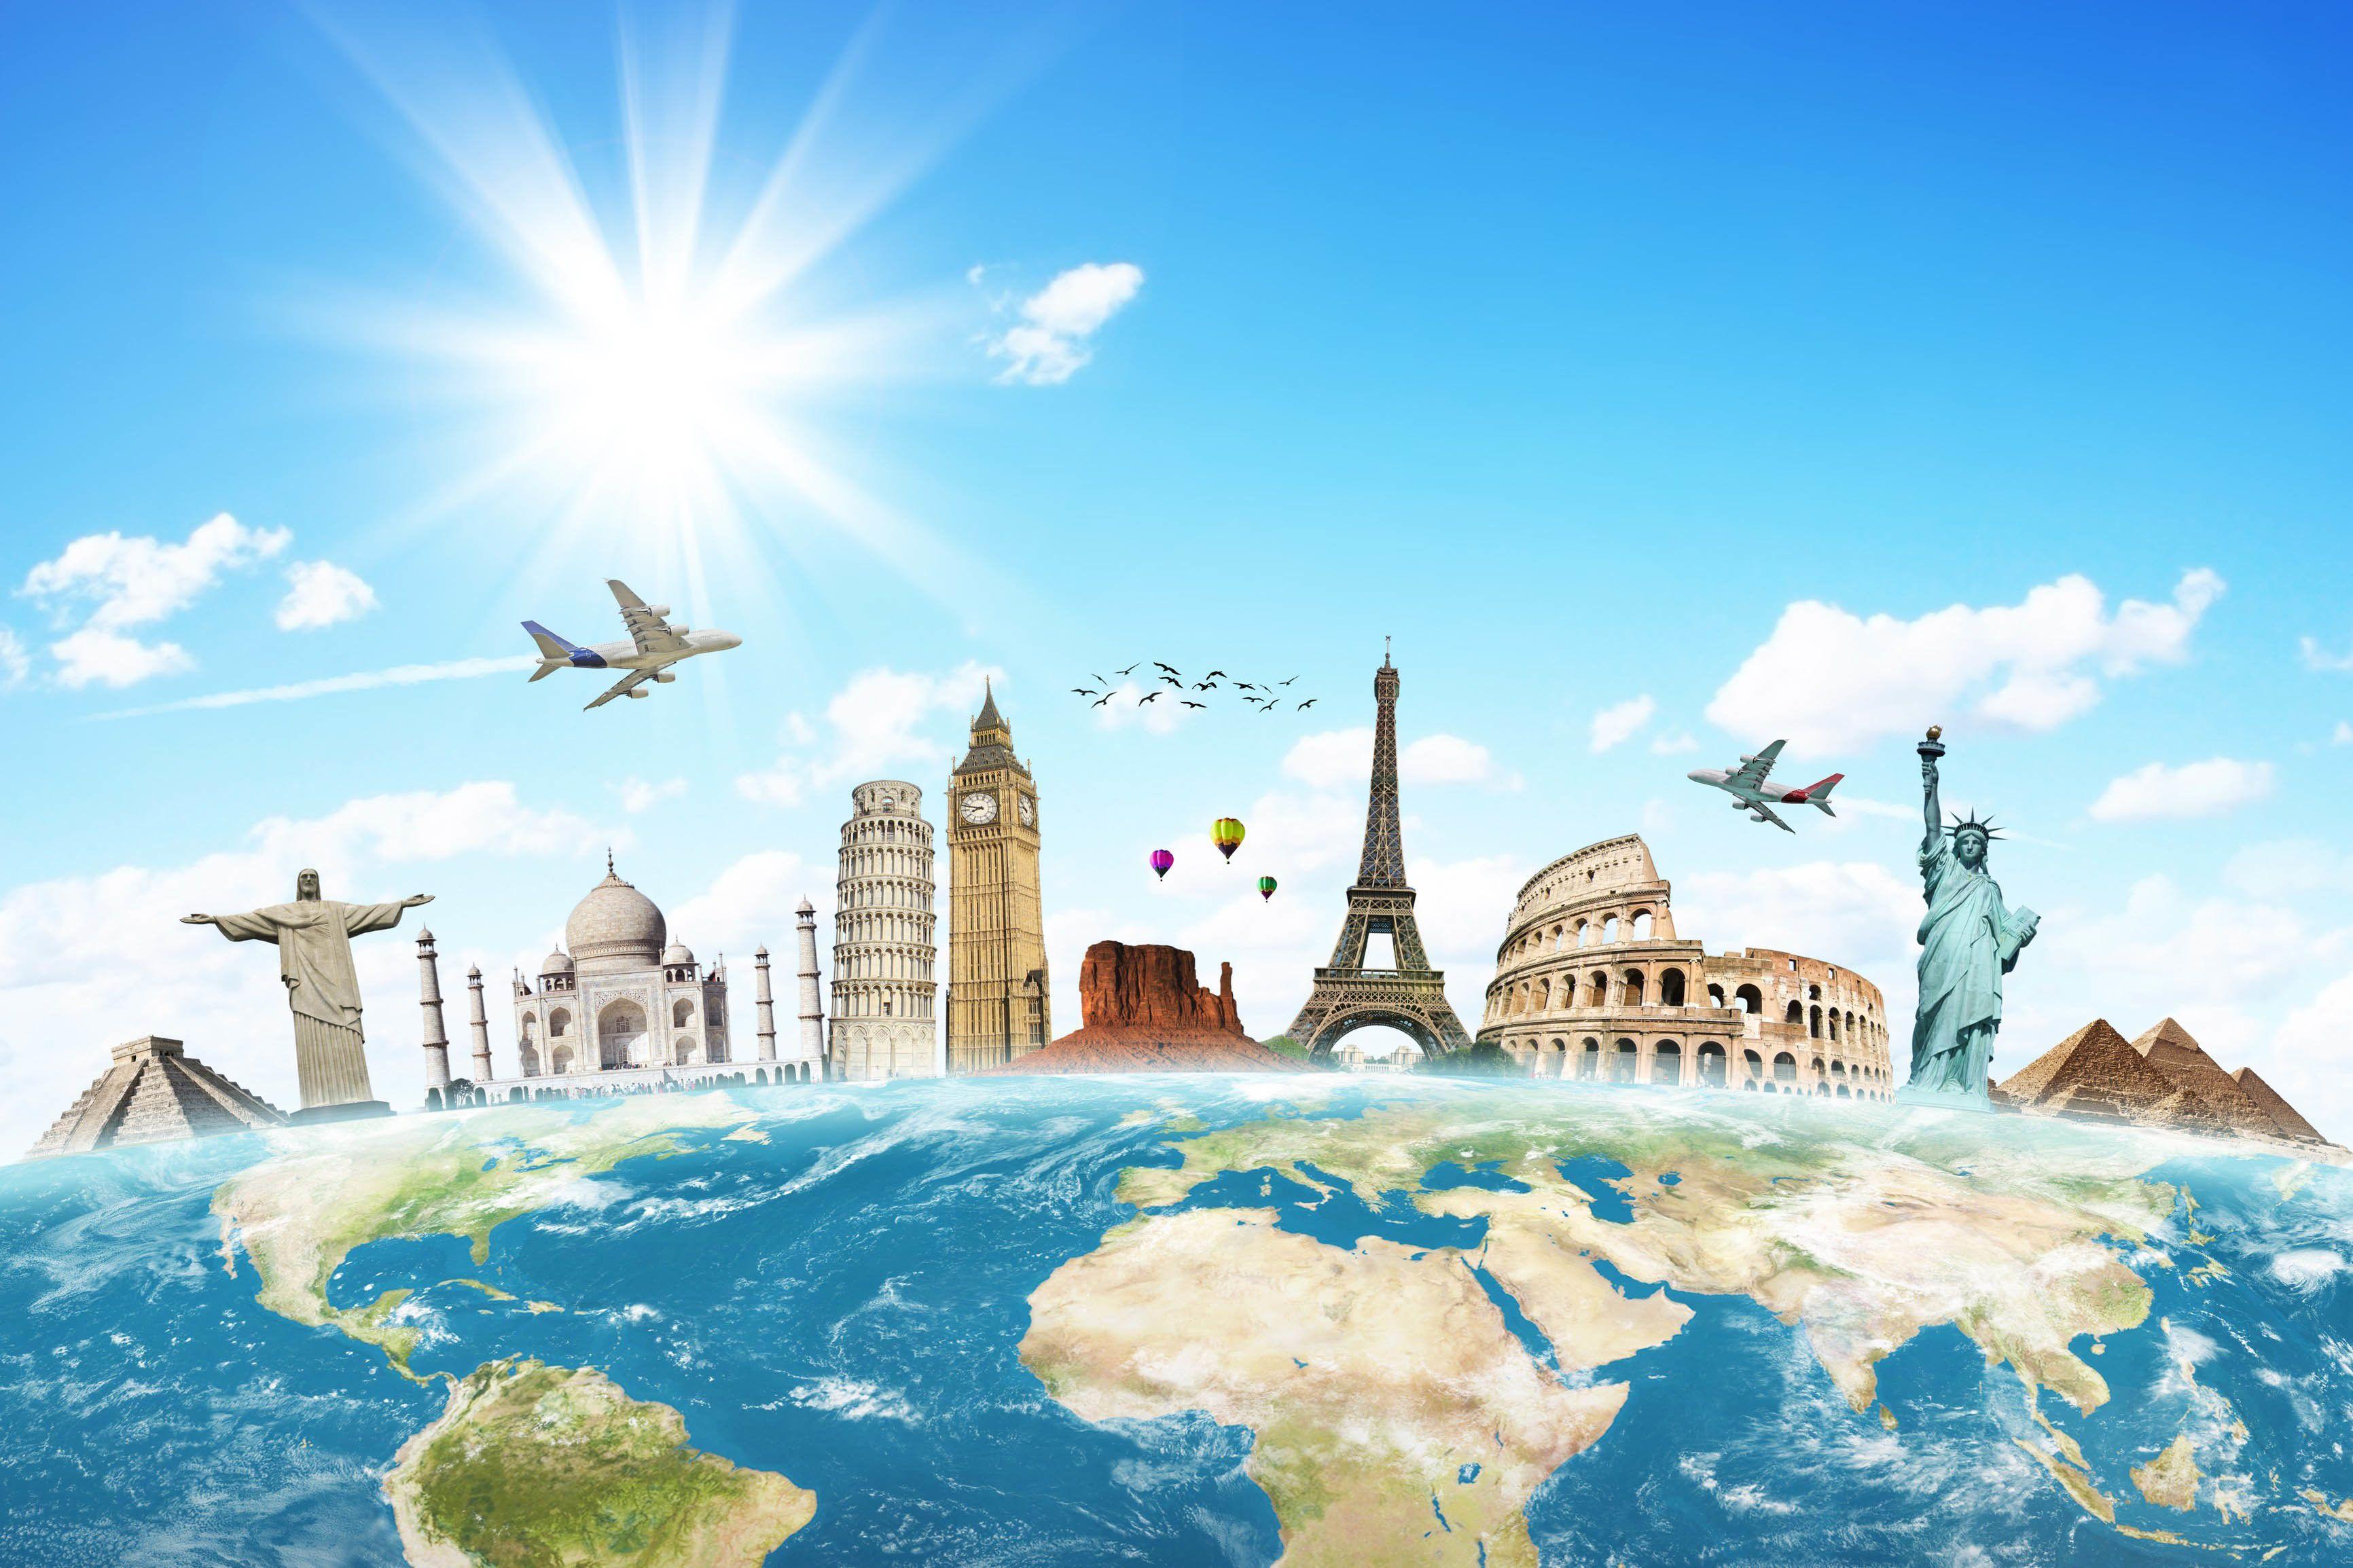 Travel wallpaper 1080p nice pics pinterest travel wallpaper travel wallpaper 1080p gumiabroncs Image collections